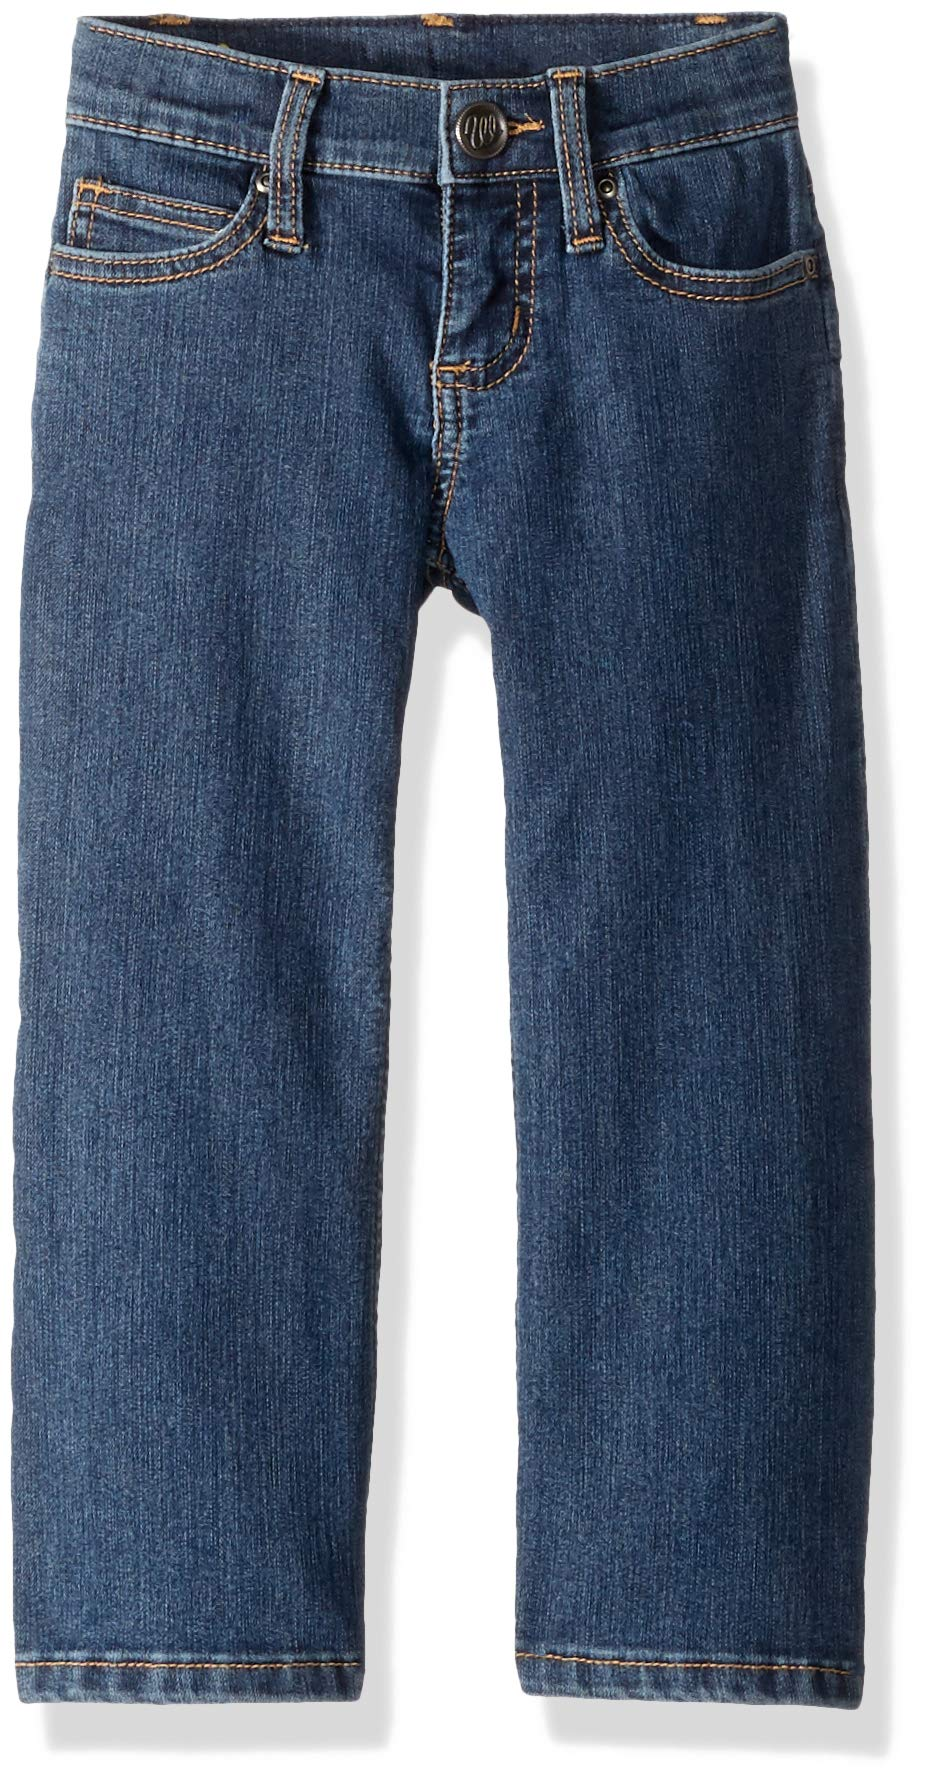 Wrangler Girls' Western Boot Cut Jean, Medium